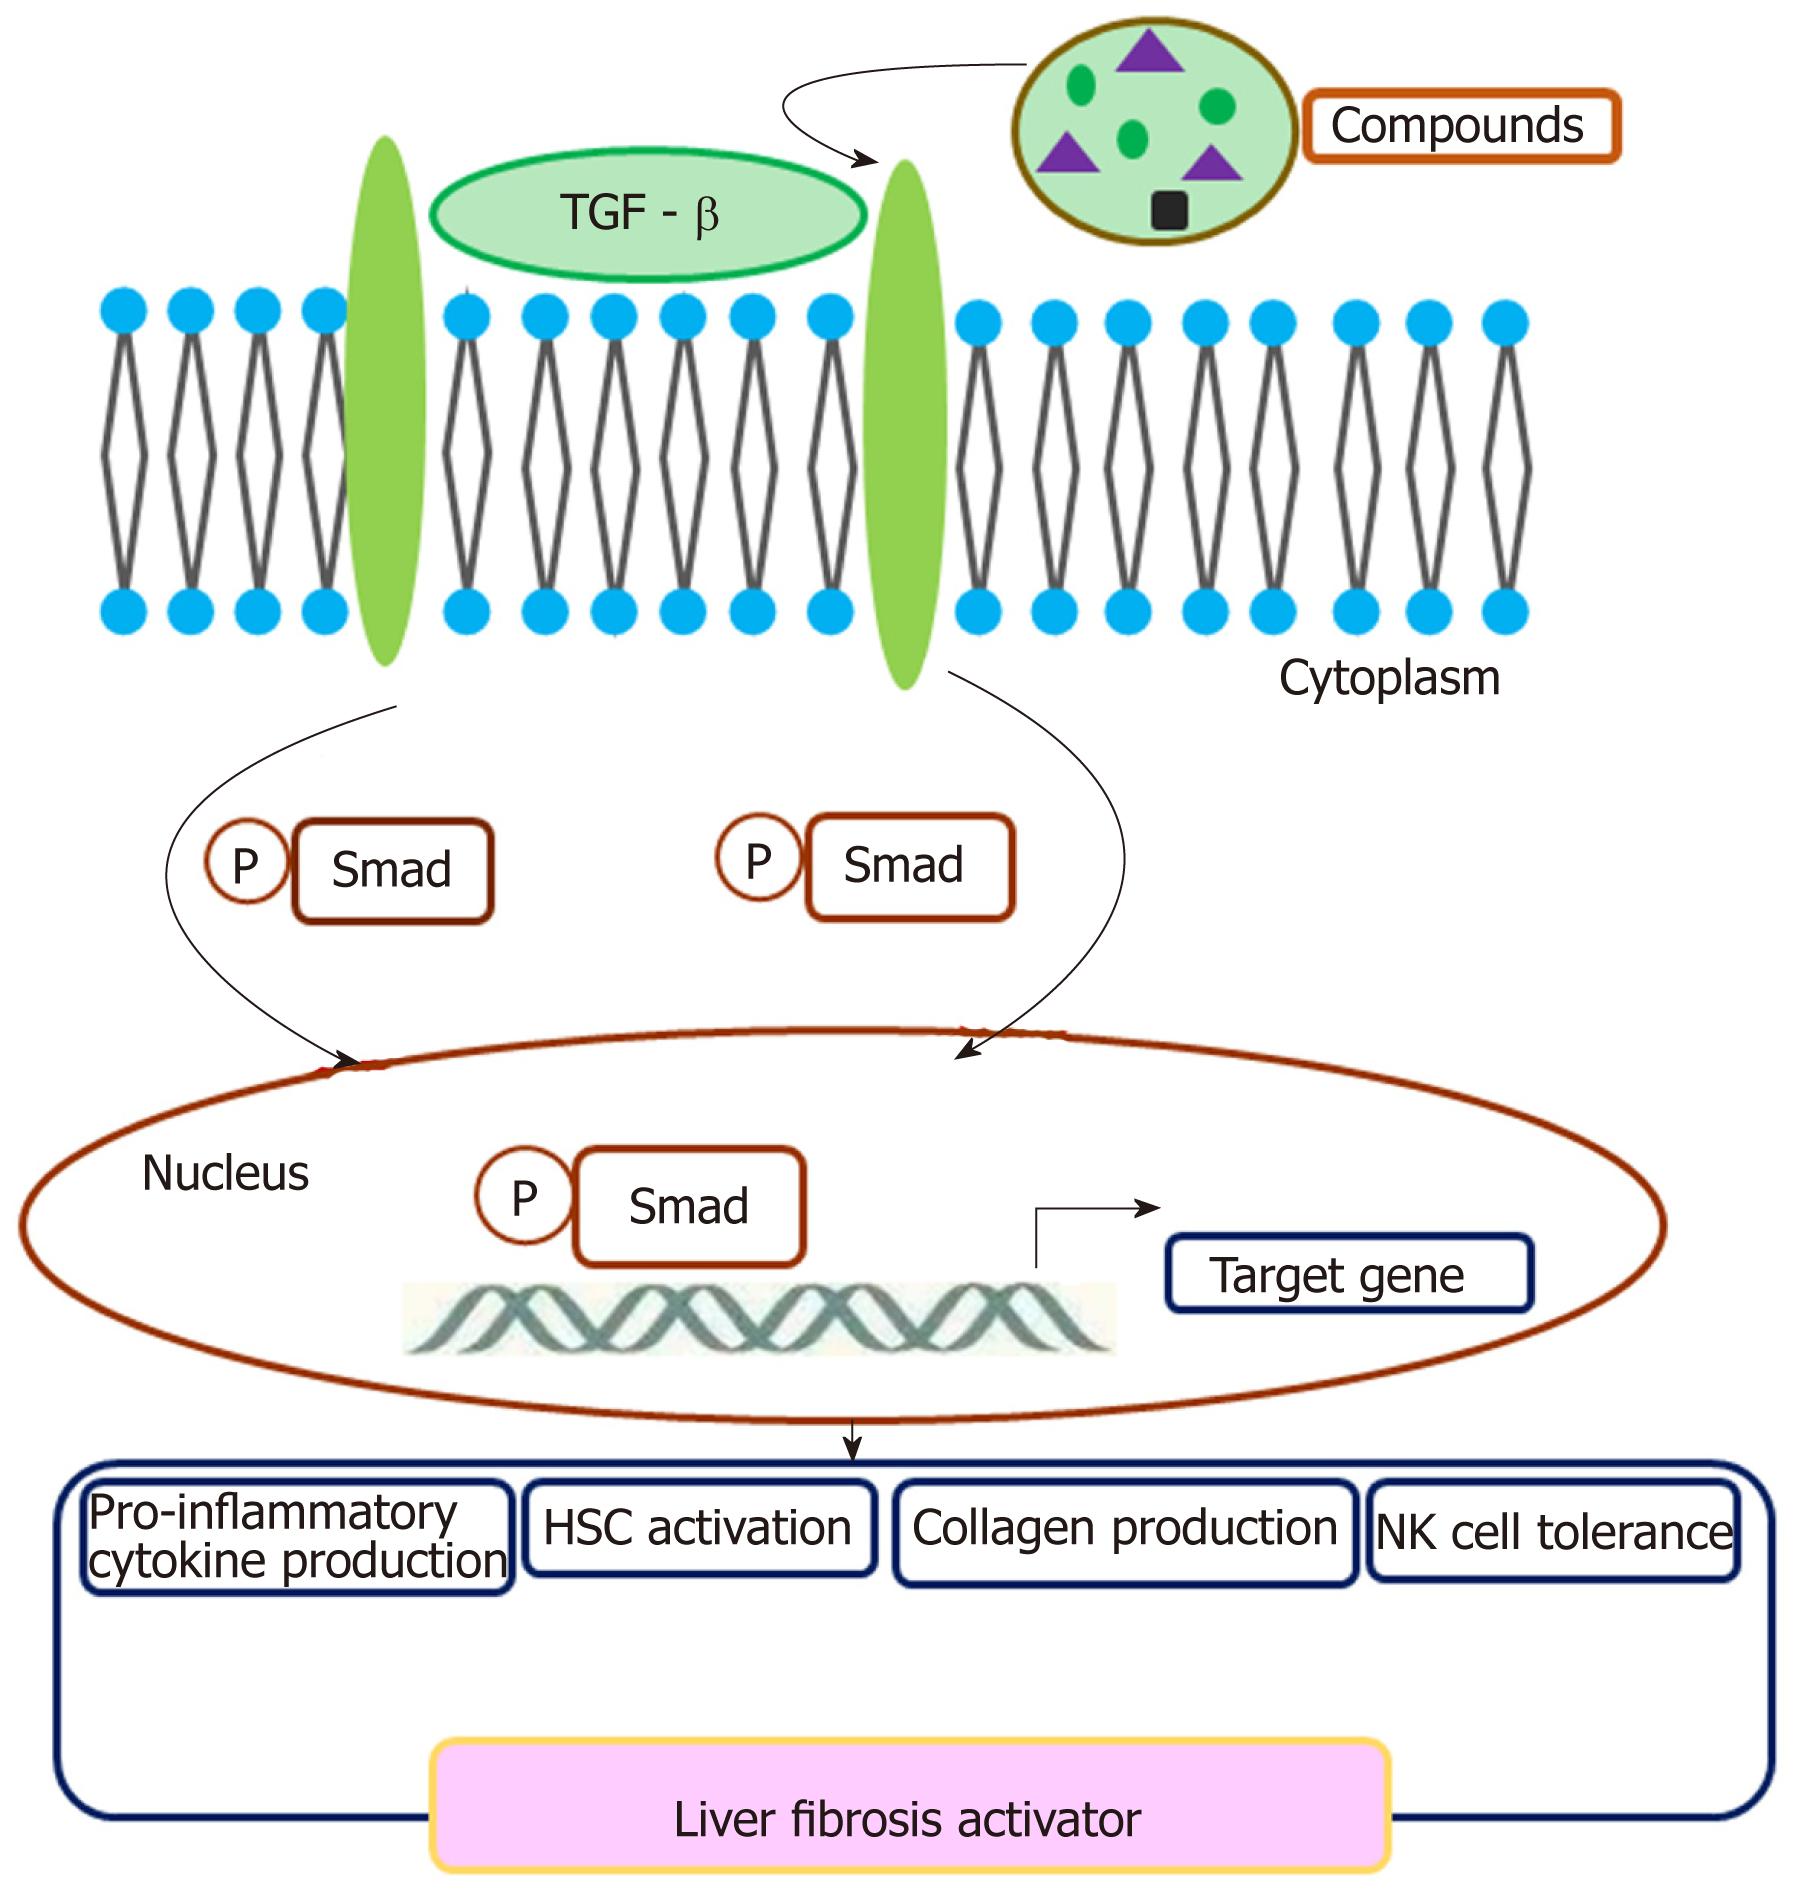 Crosstalk network among multiple inflammatory mediators in